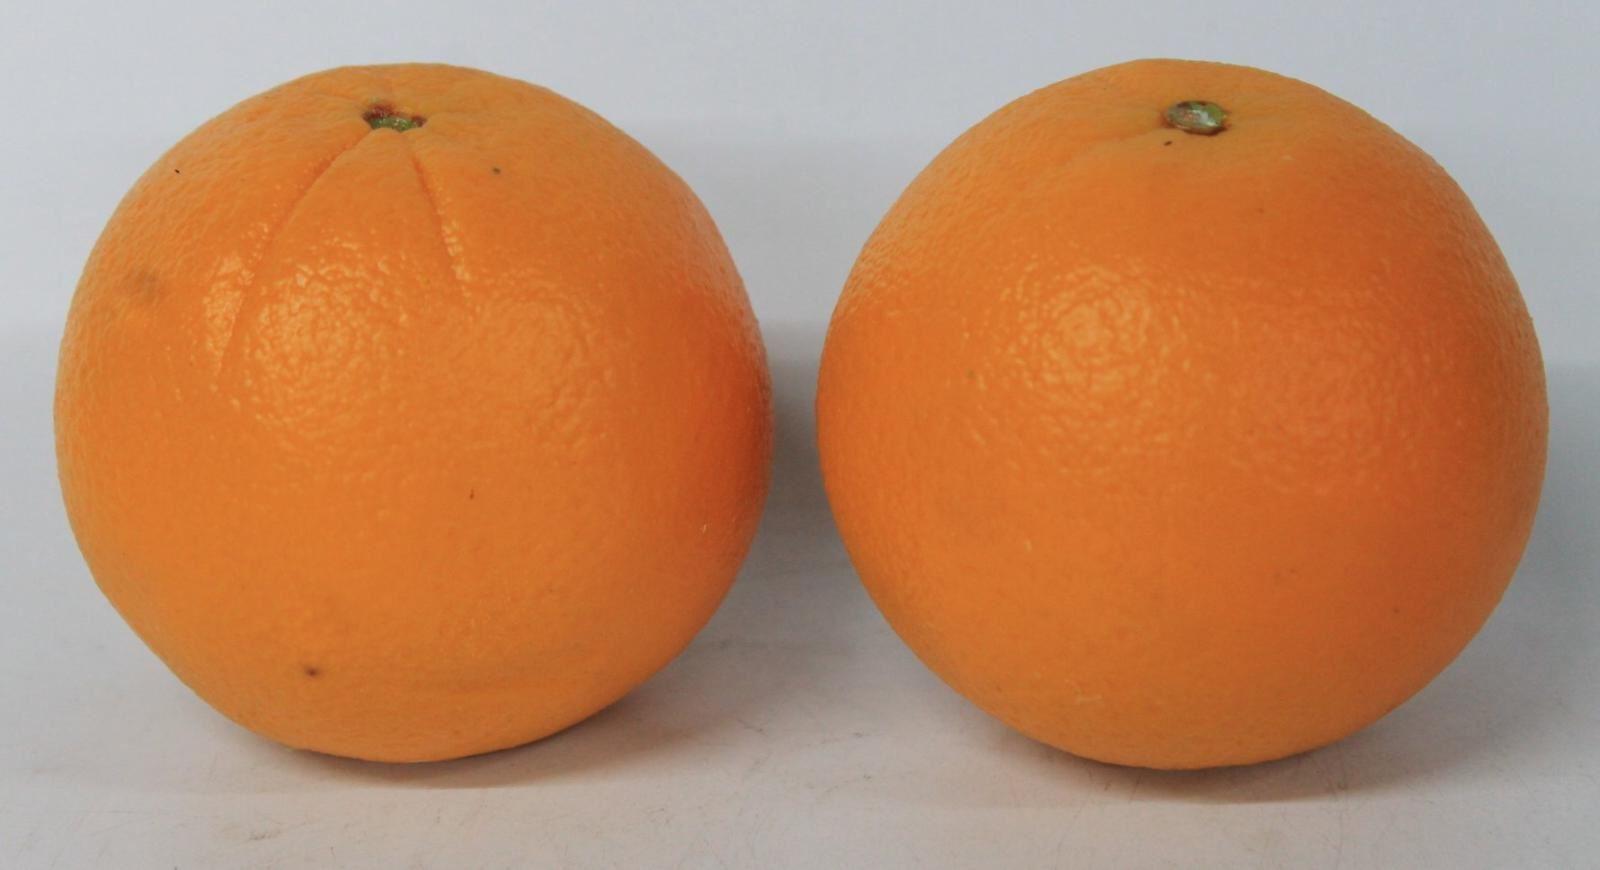 100% Waar Pair Of Lifelike Artificial Plastic Orange Fruit Decorative Food Display Props